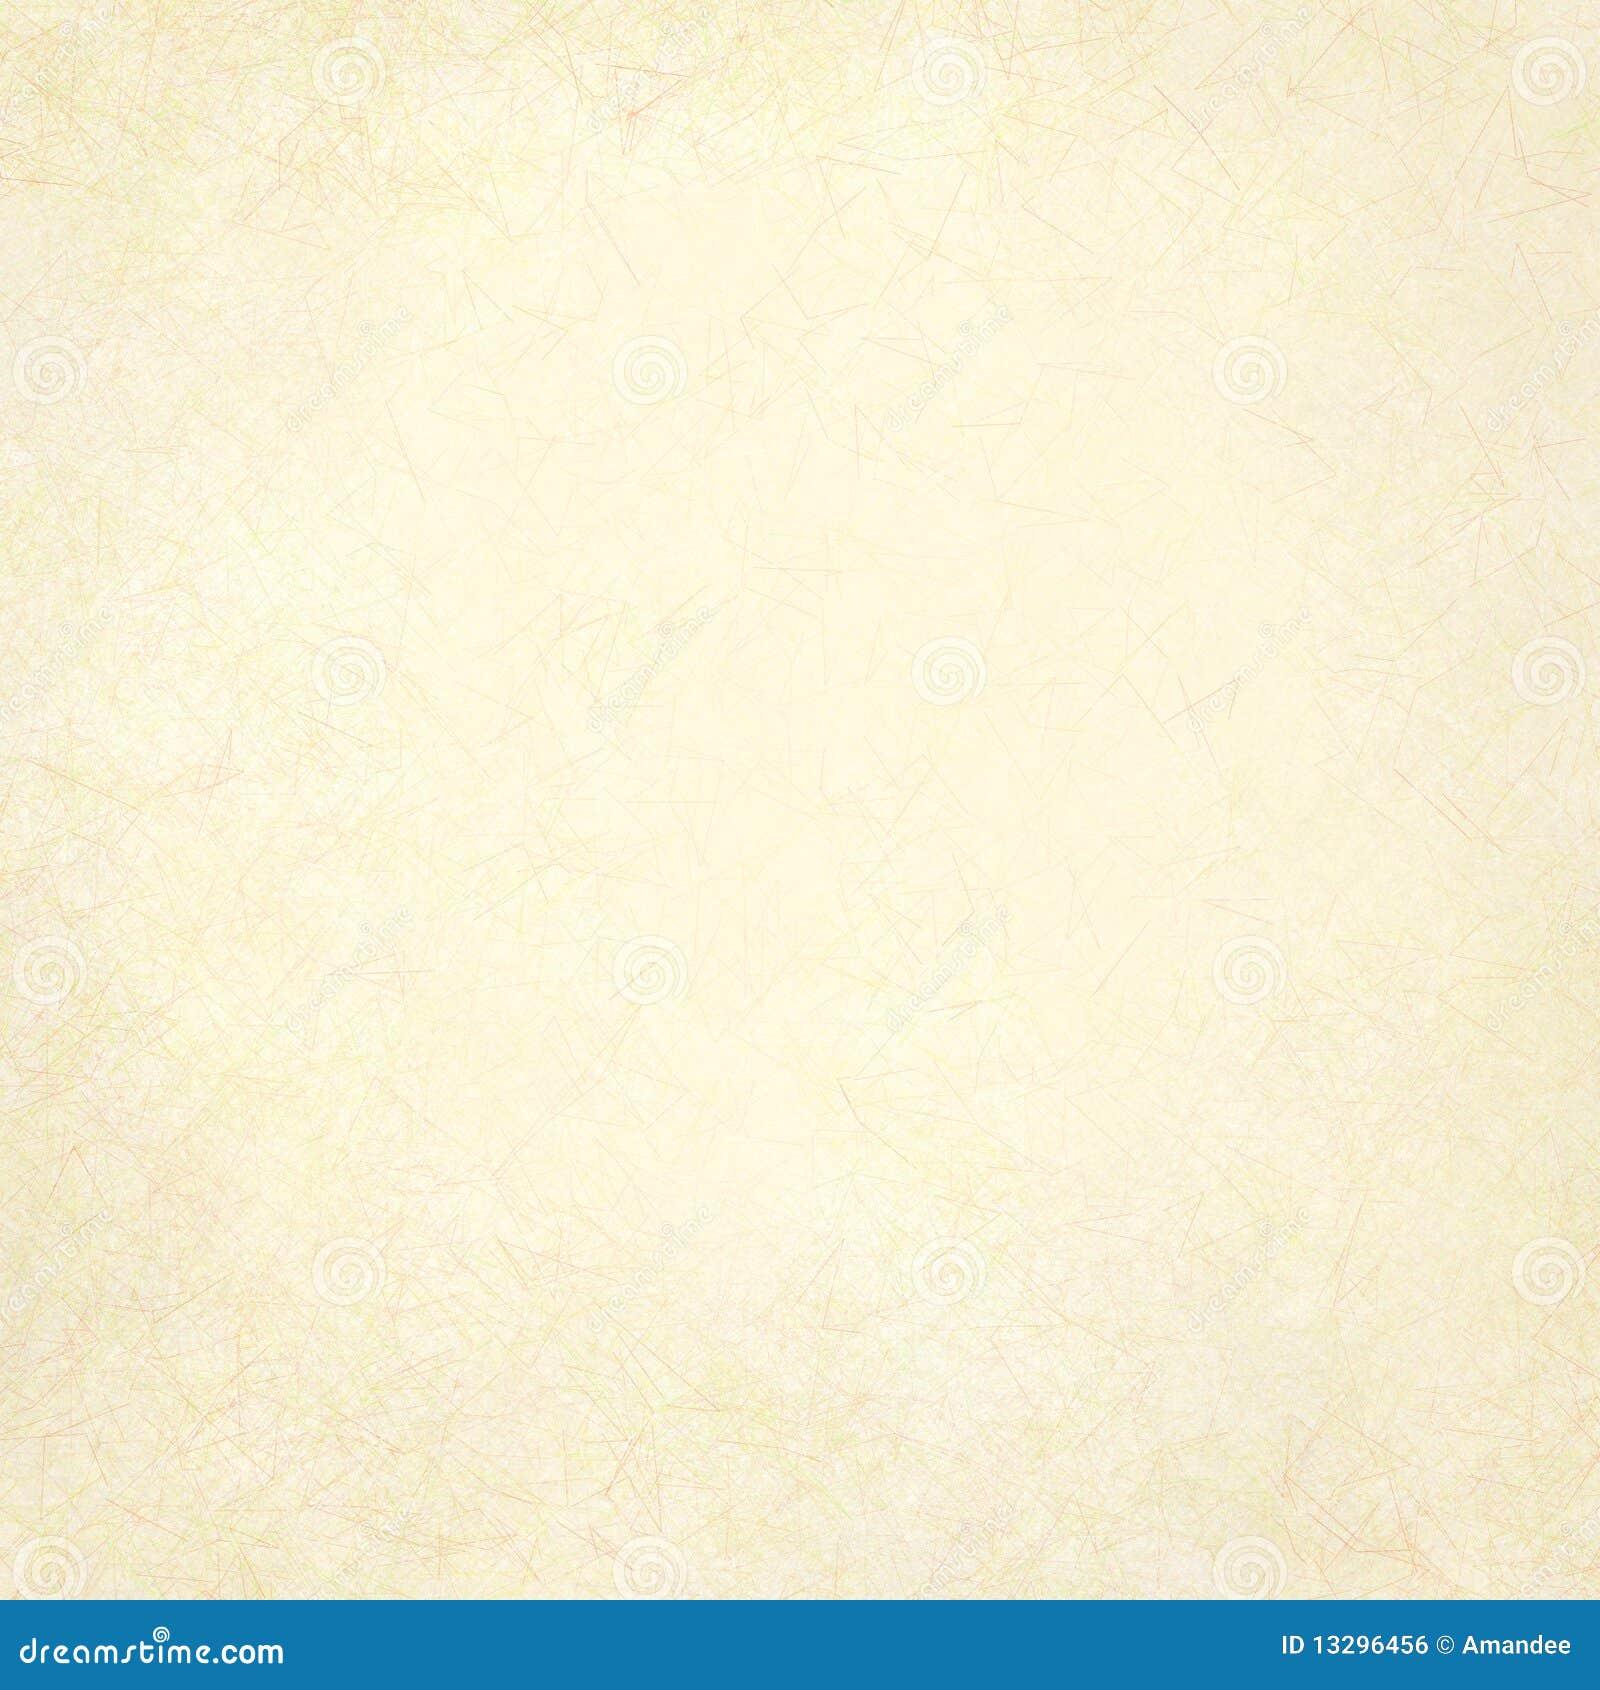 Cream Off White Antique Background Royalty Free Stock Image - Image ...